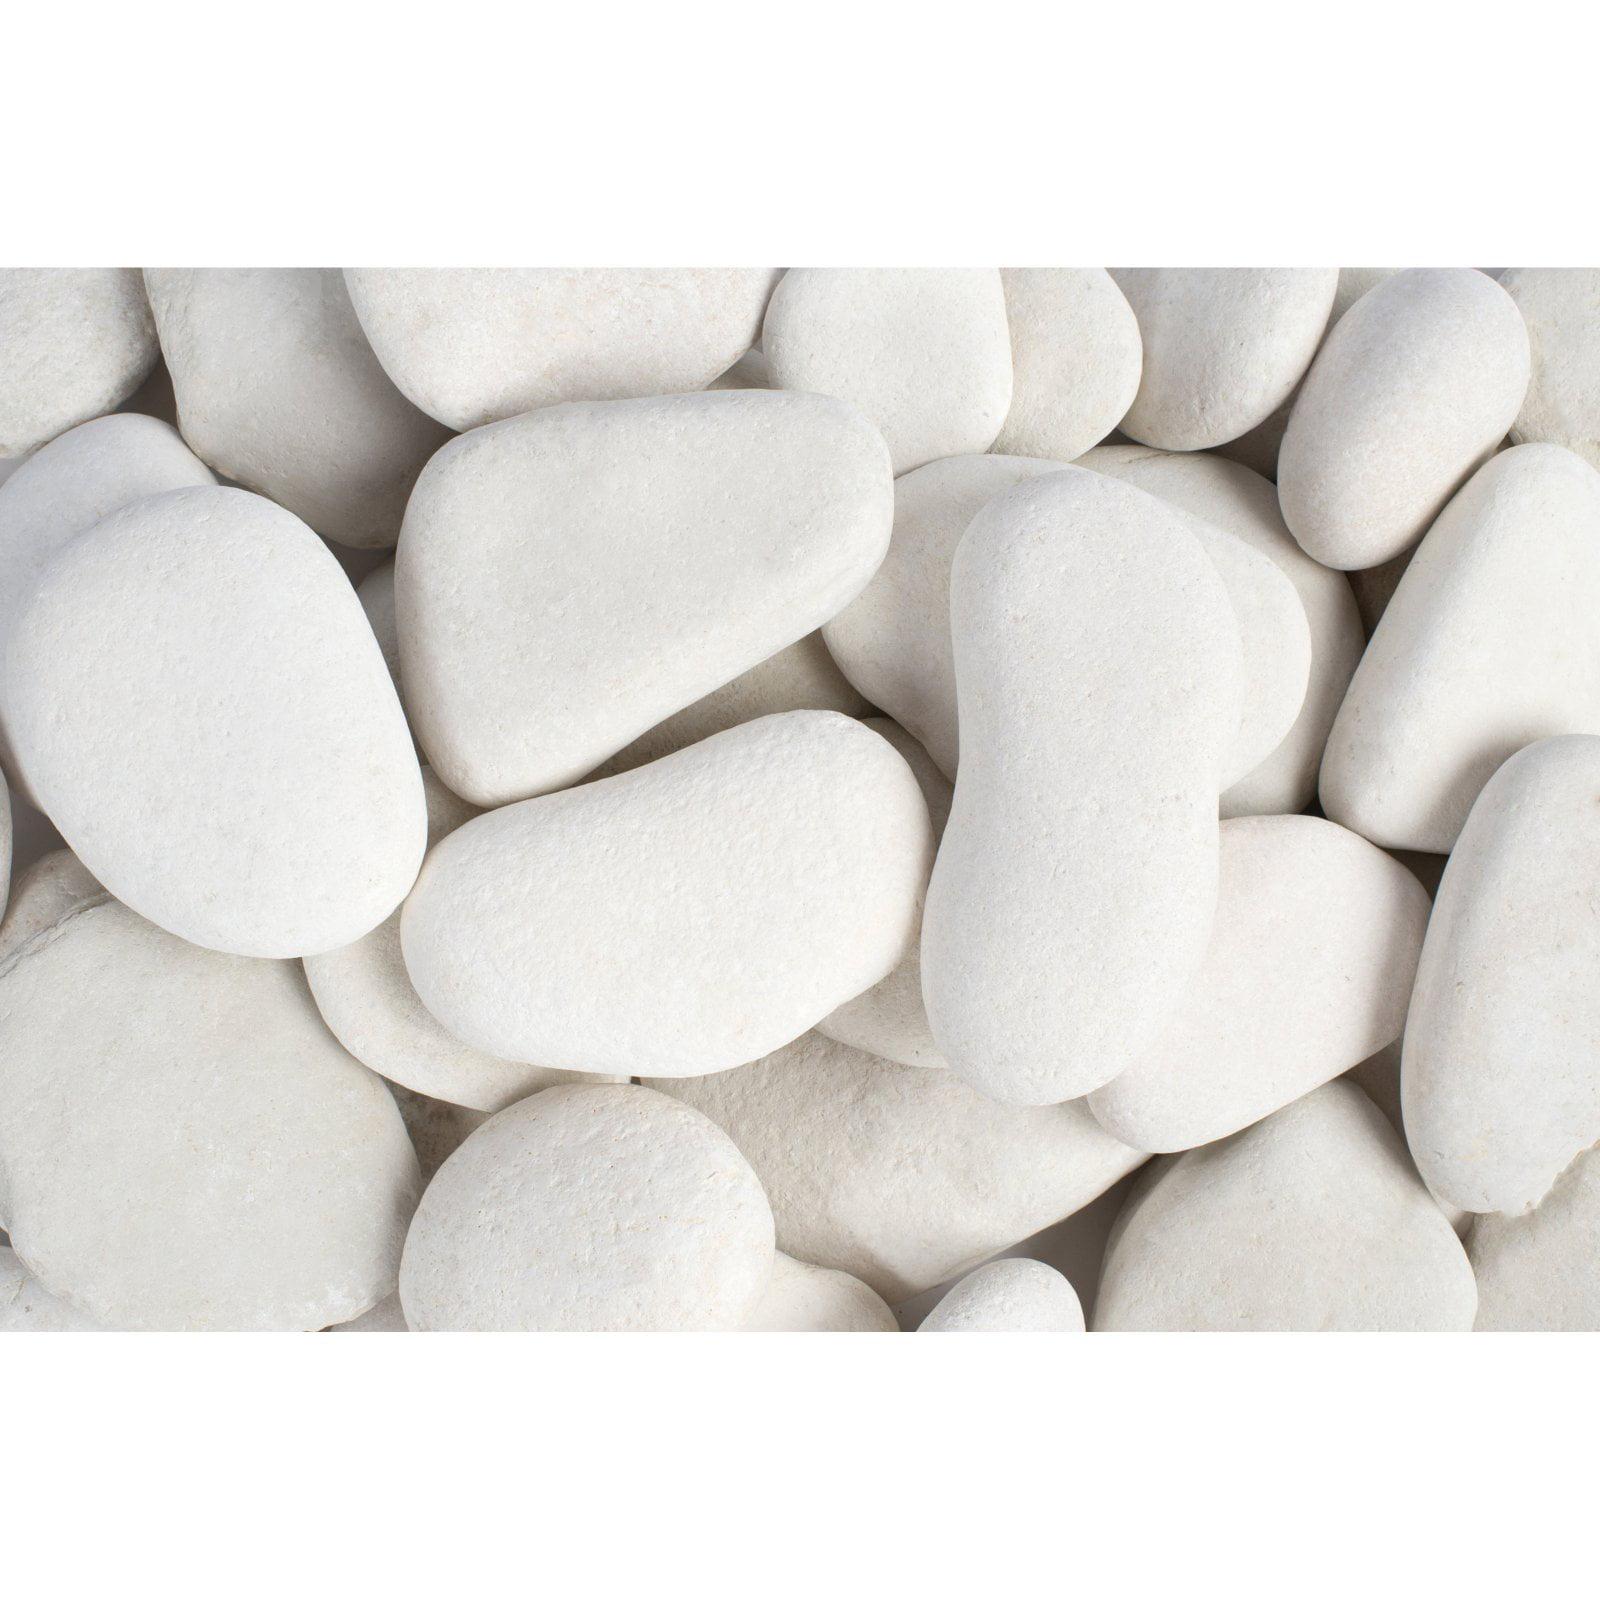 "Margo 30 lb Large Flat Caribbean Beach Pebbles, 3"" to 5"